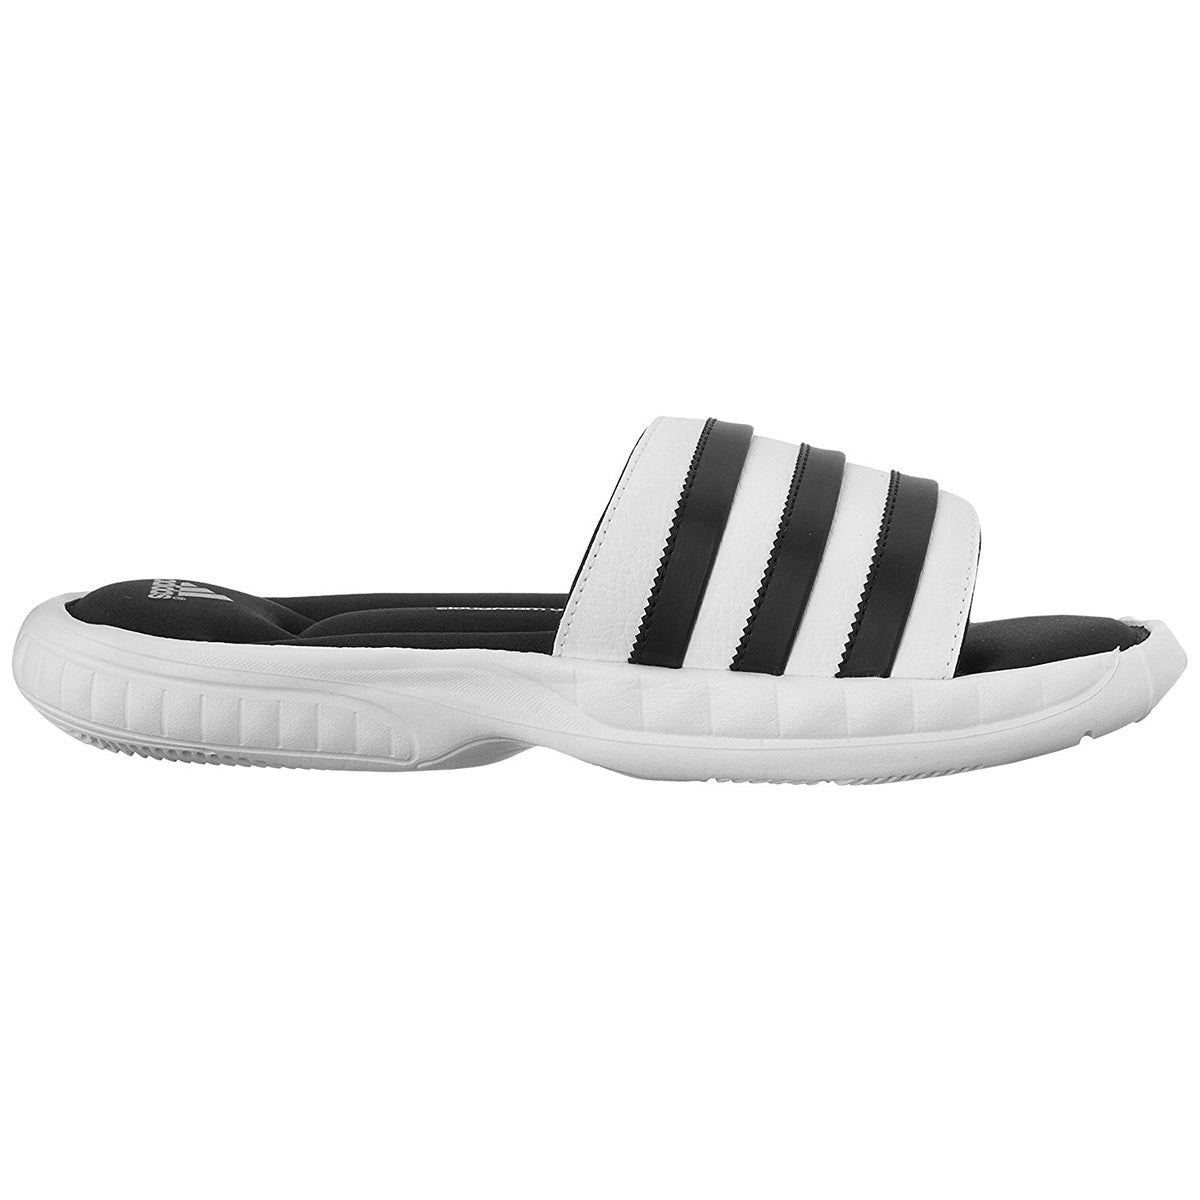 9ac08fa3b1c856 ... Shop Adidas Superstar 3G CloudFoam Athletic Slide Sandals - WhiteBlack  - Free Shipping On Orders Over ...